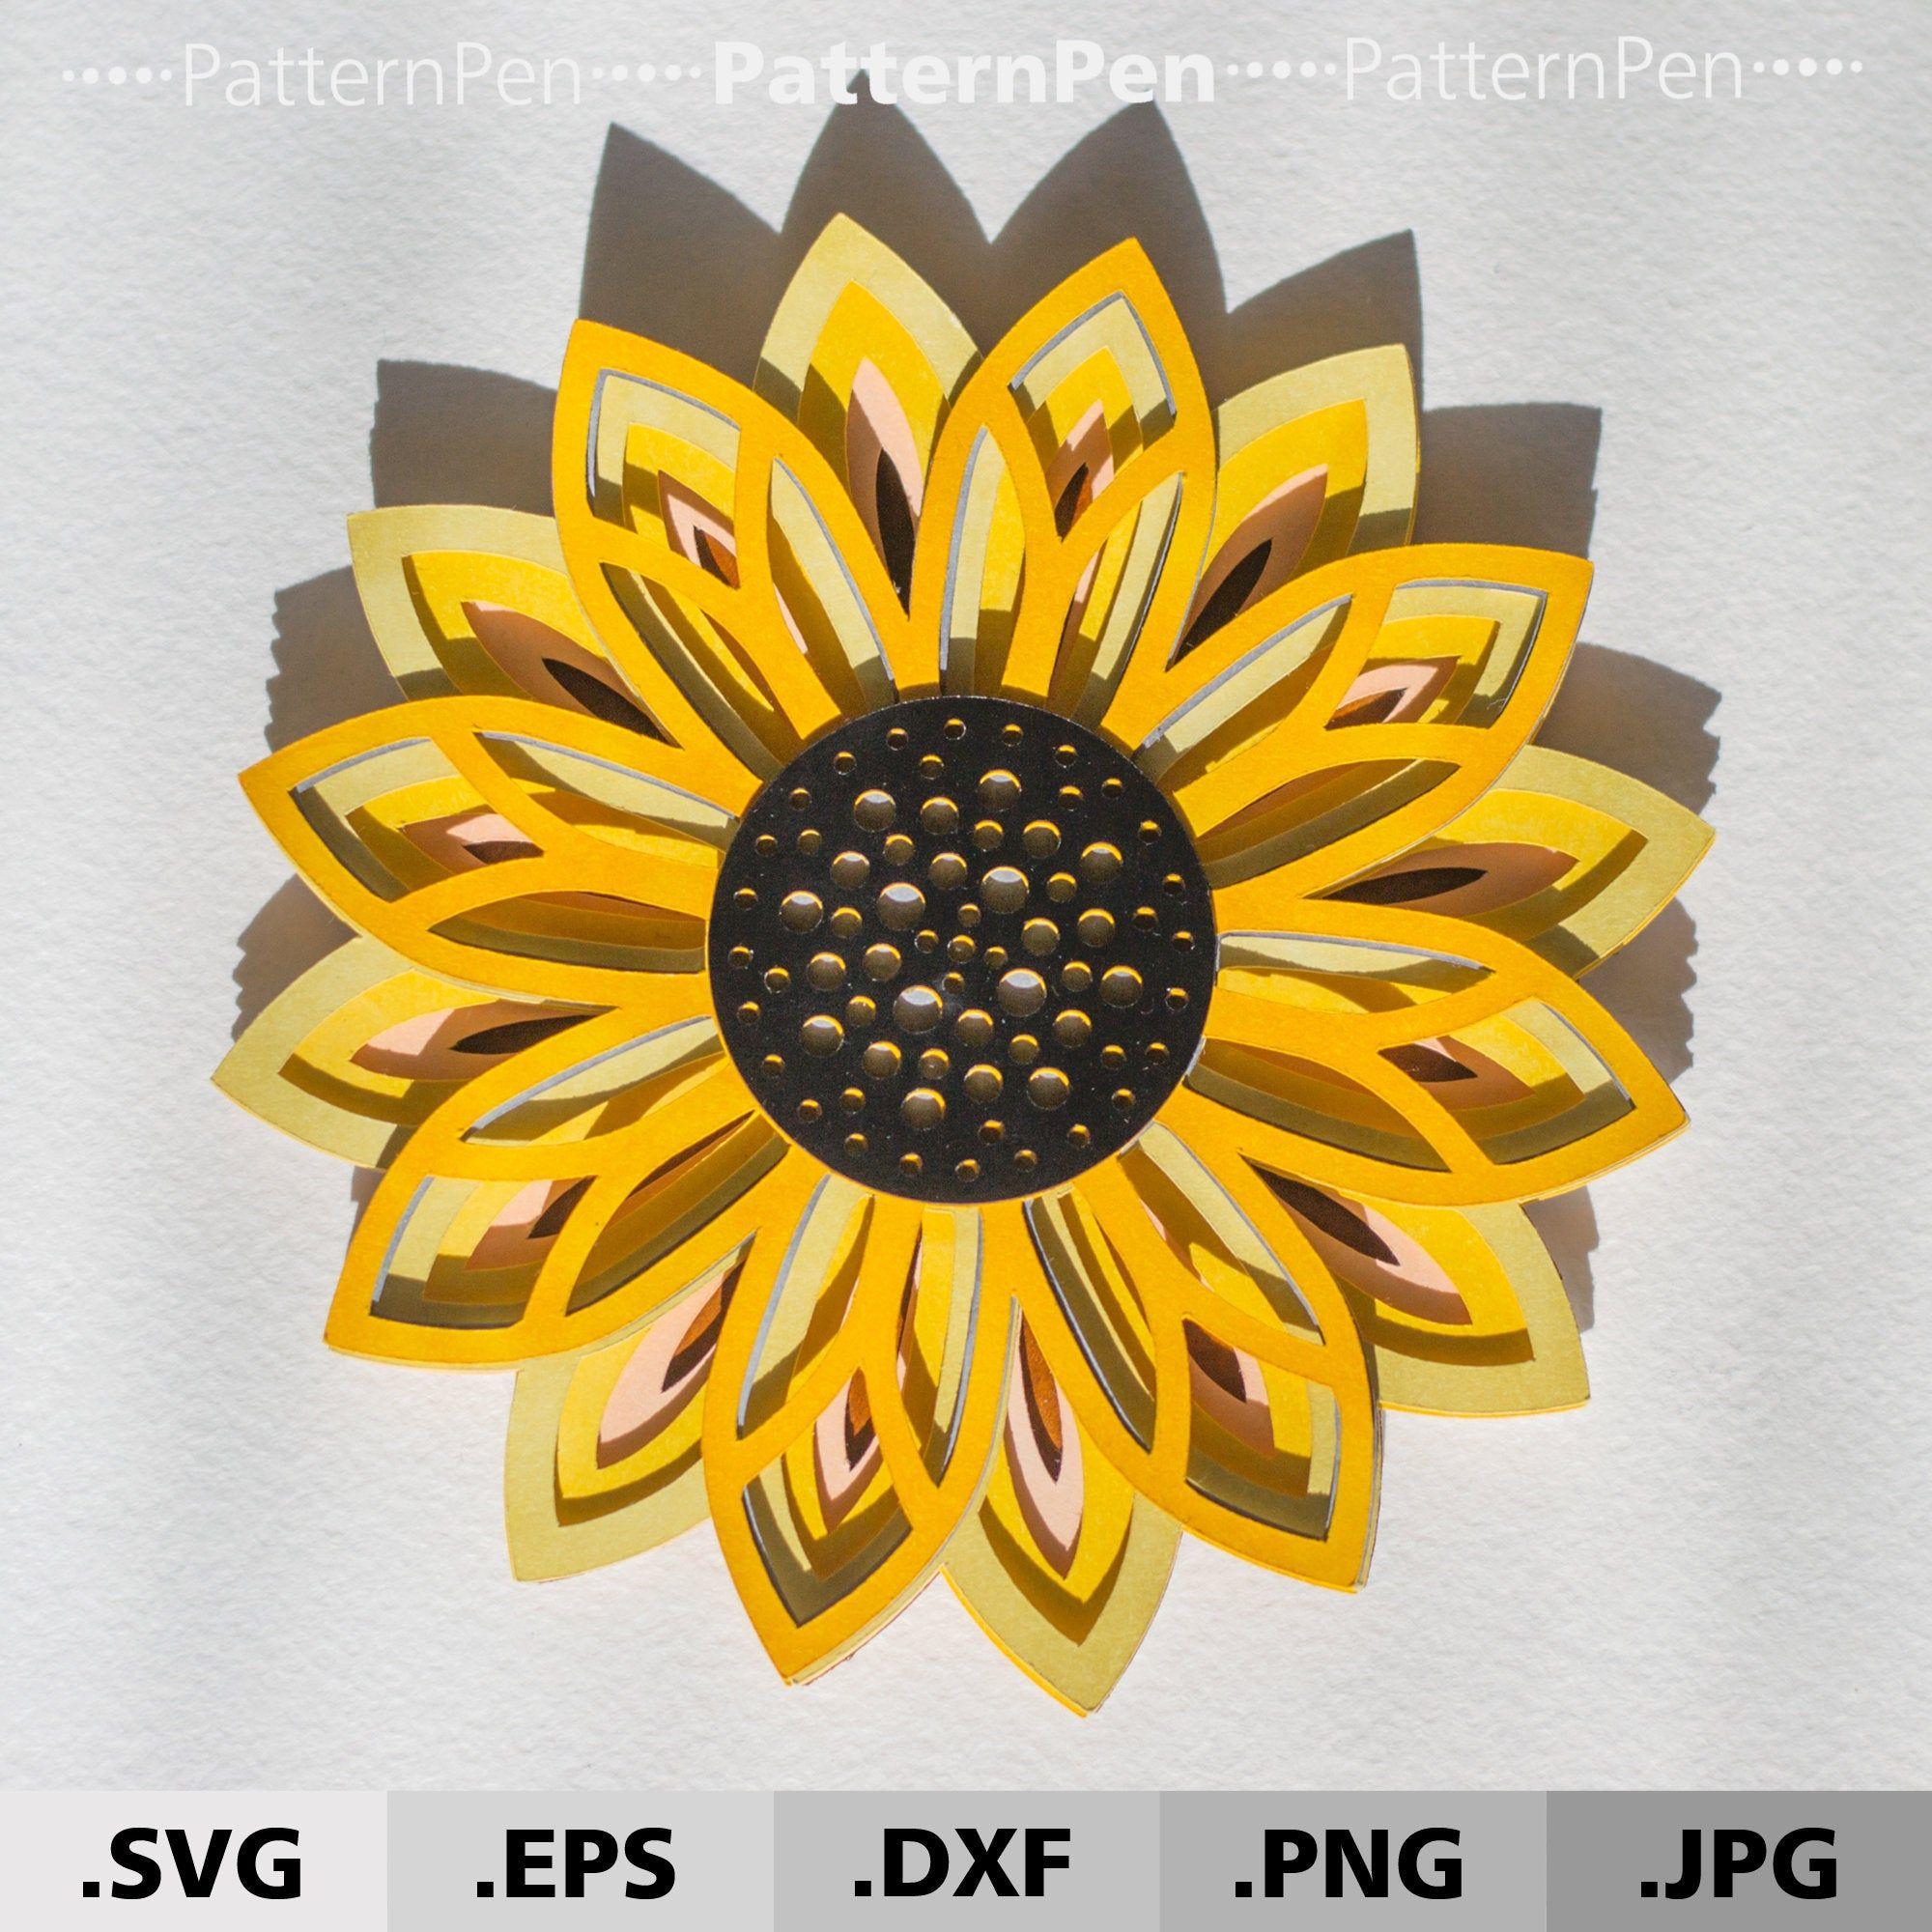 47+ Layered Sunflower Mandala Svg – SVG Bundles